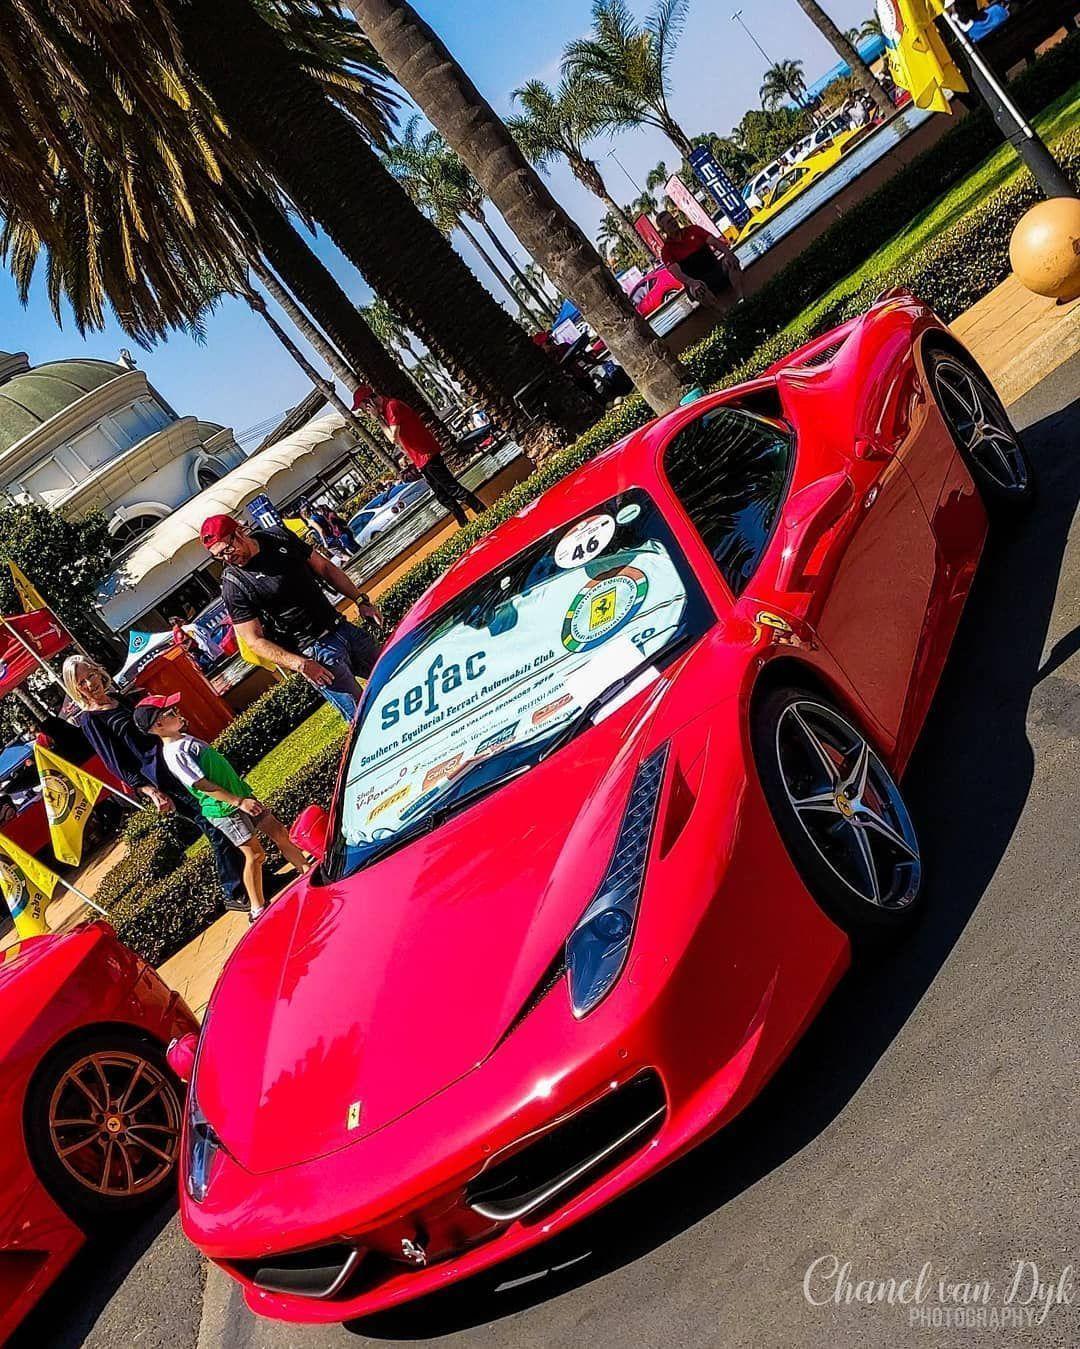 Ferrari 458 Italia ... Ferrari 458 Italia ... Ferrari 458 Italia ... Ferrari 458 Italia ... Ferrari